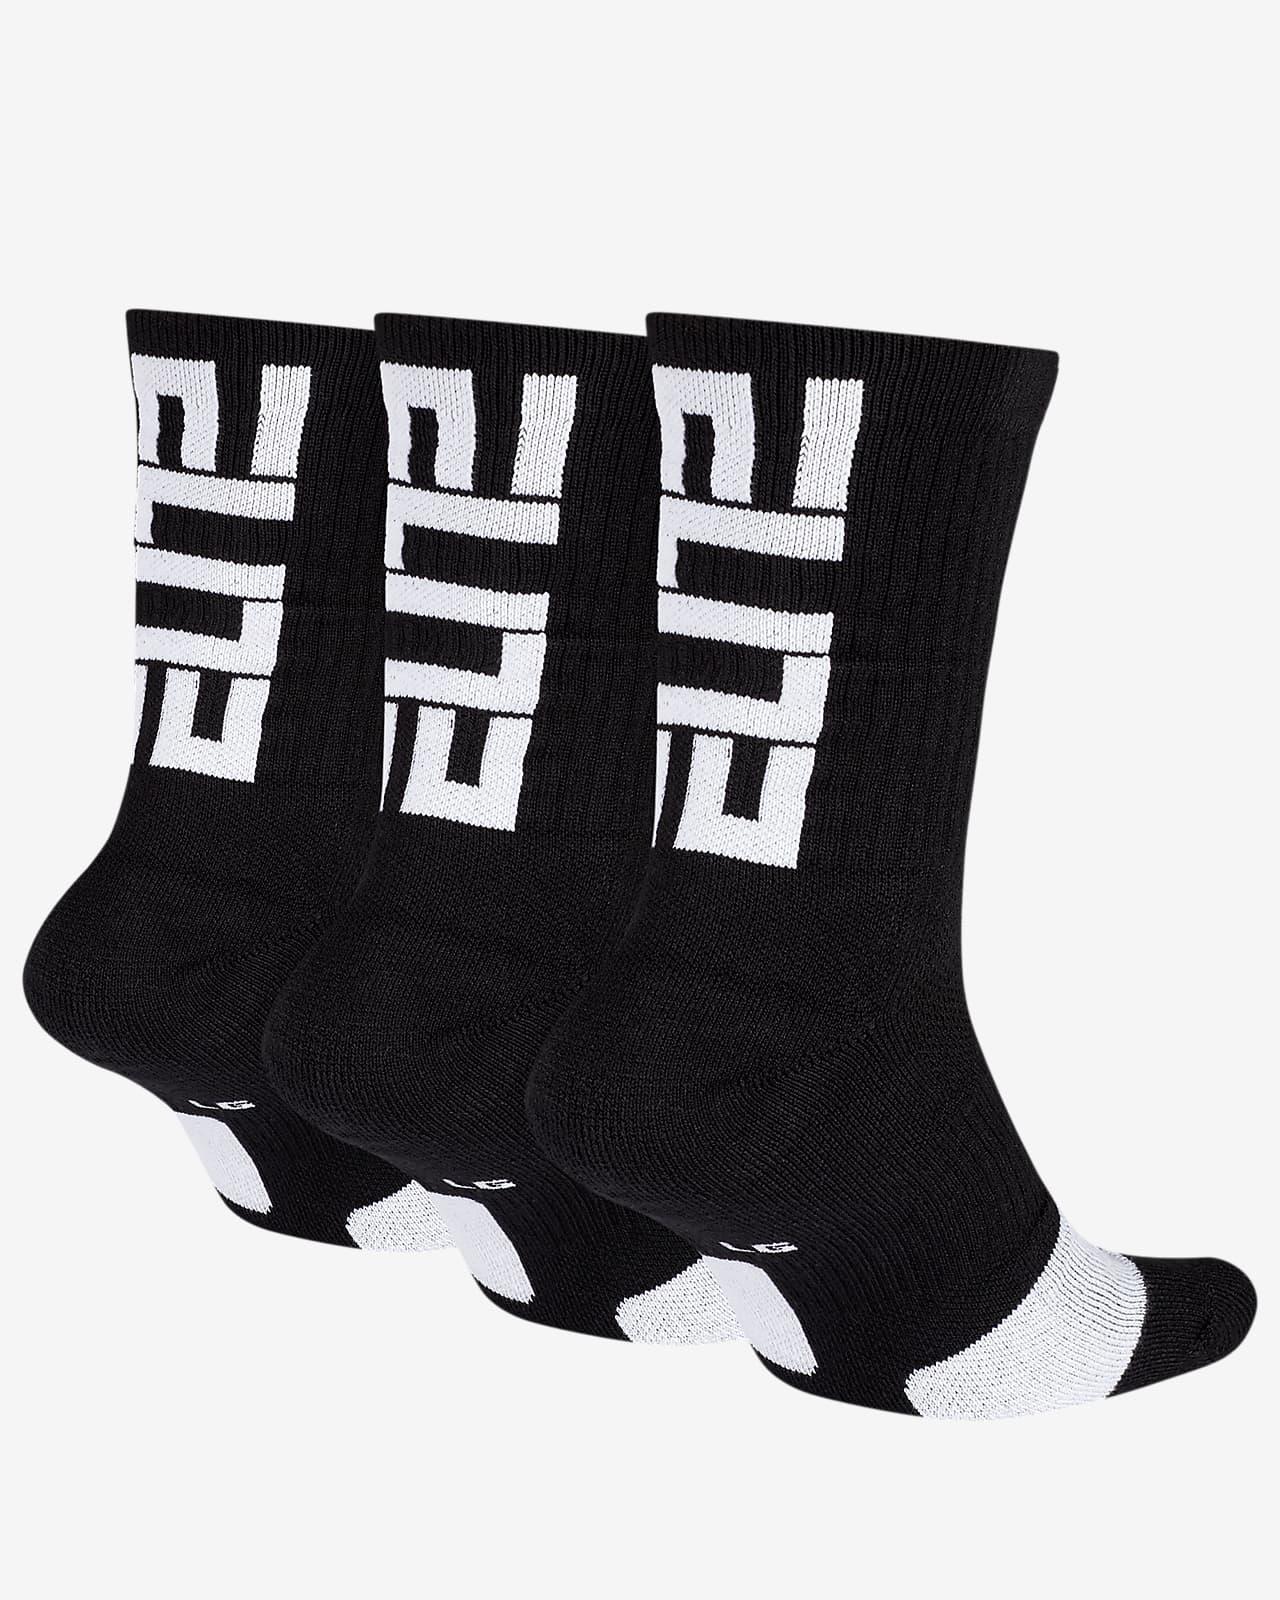 Nike Elite Basketball Crew Socks (3